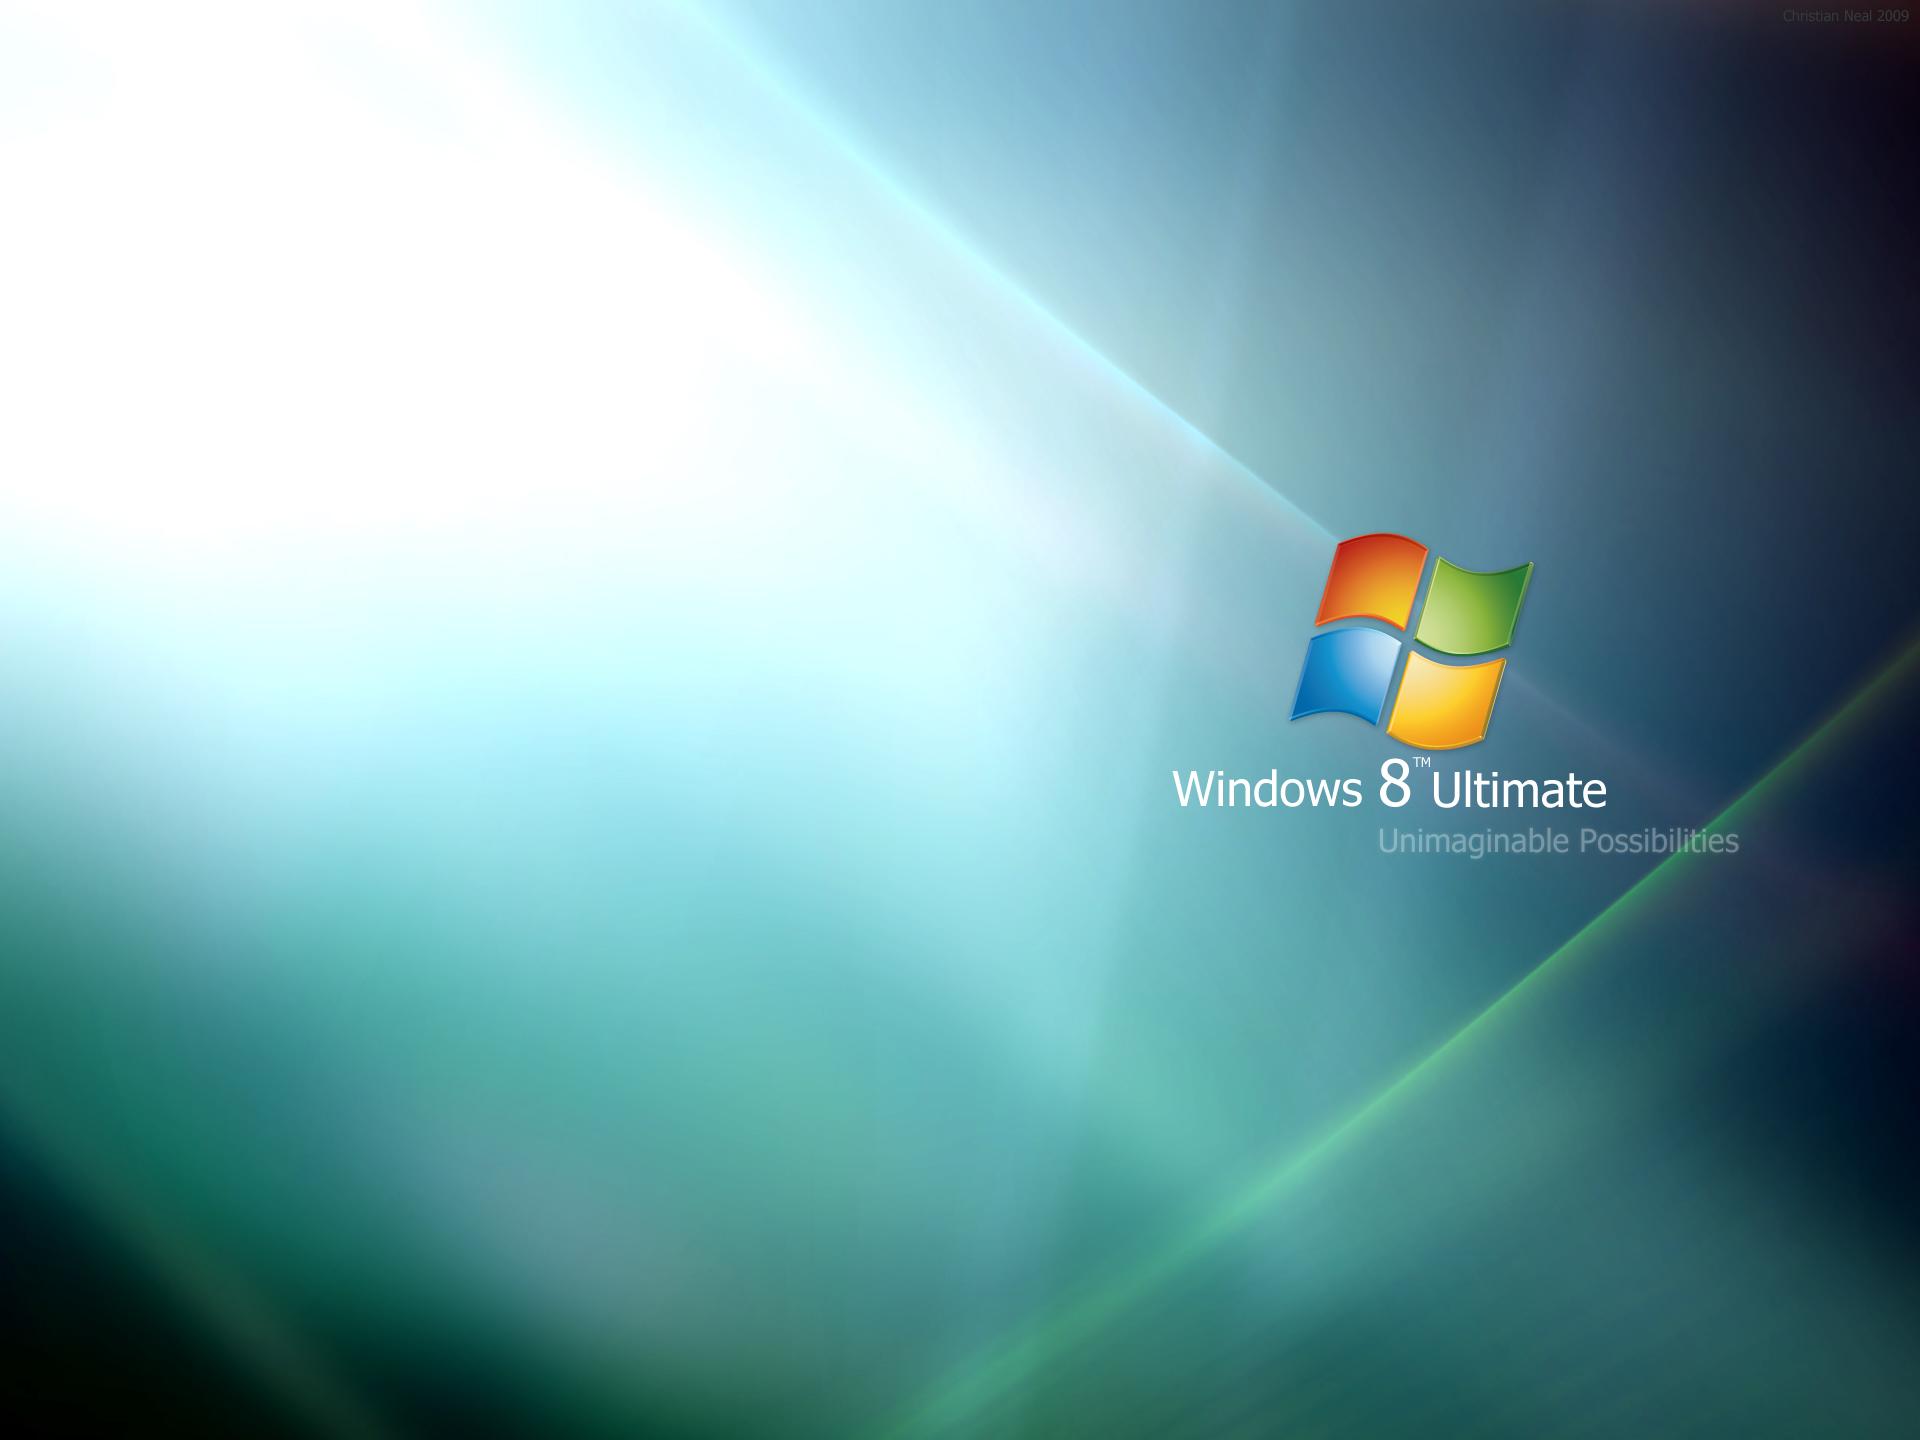 4k Wallpaper Microsoft: 4K Live Wallpaper Windows 10